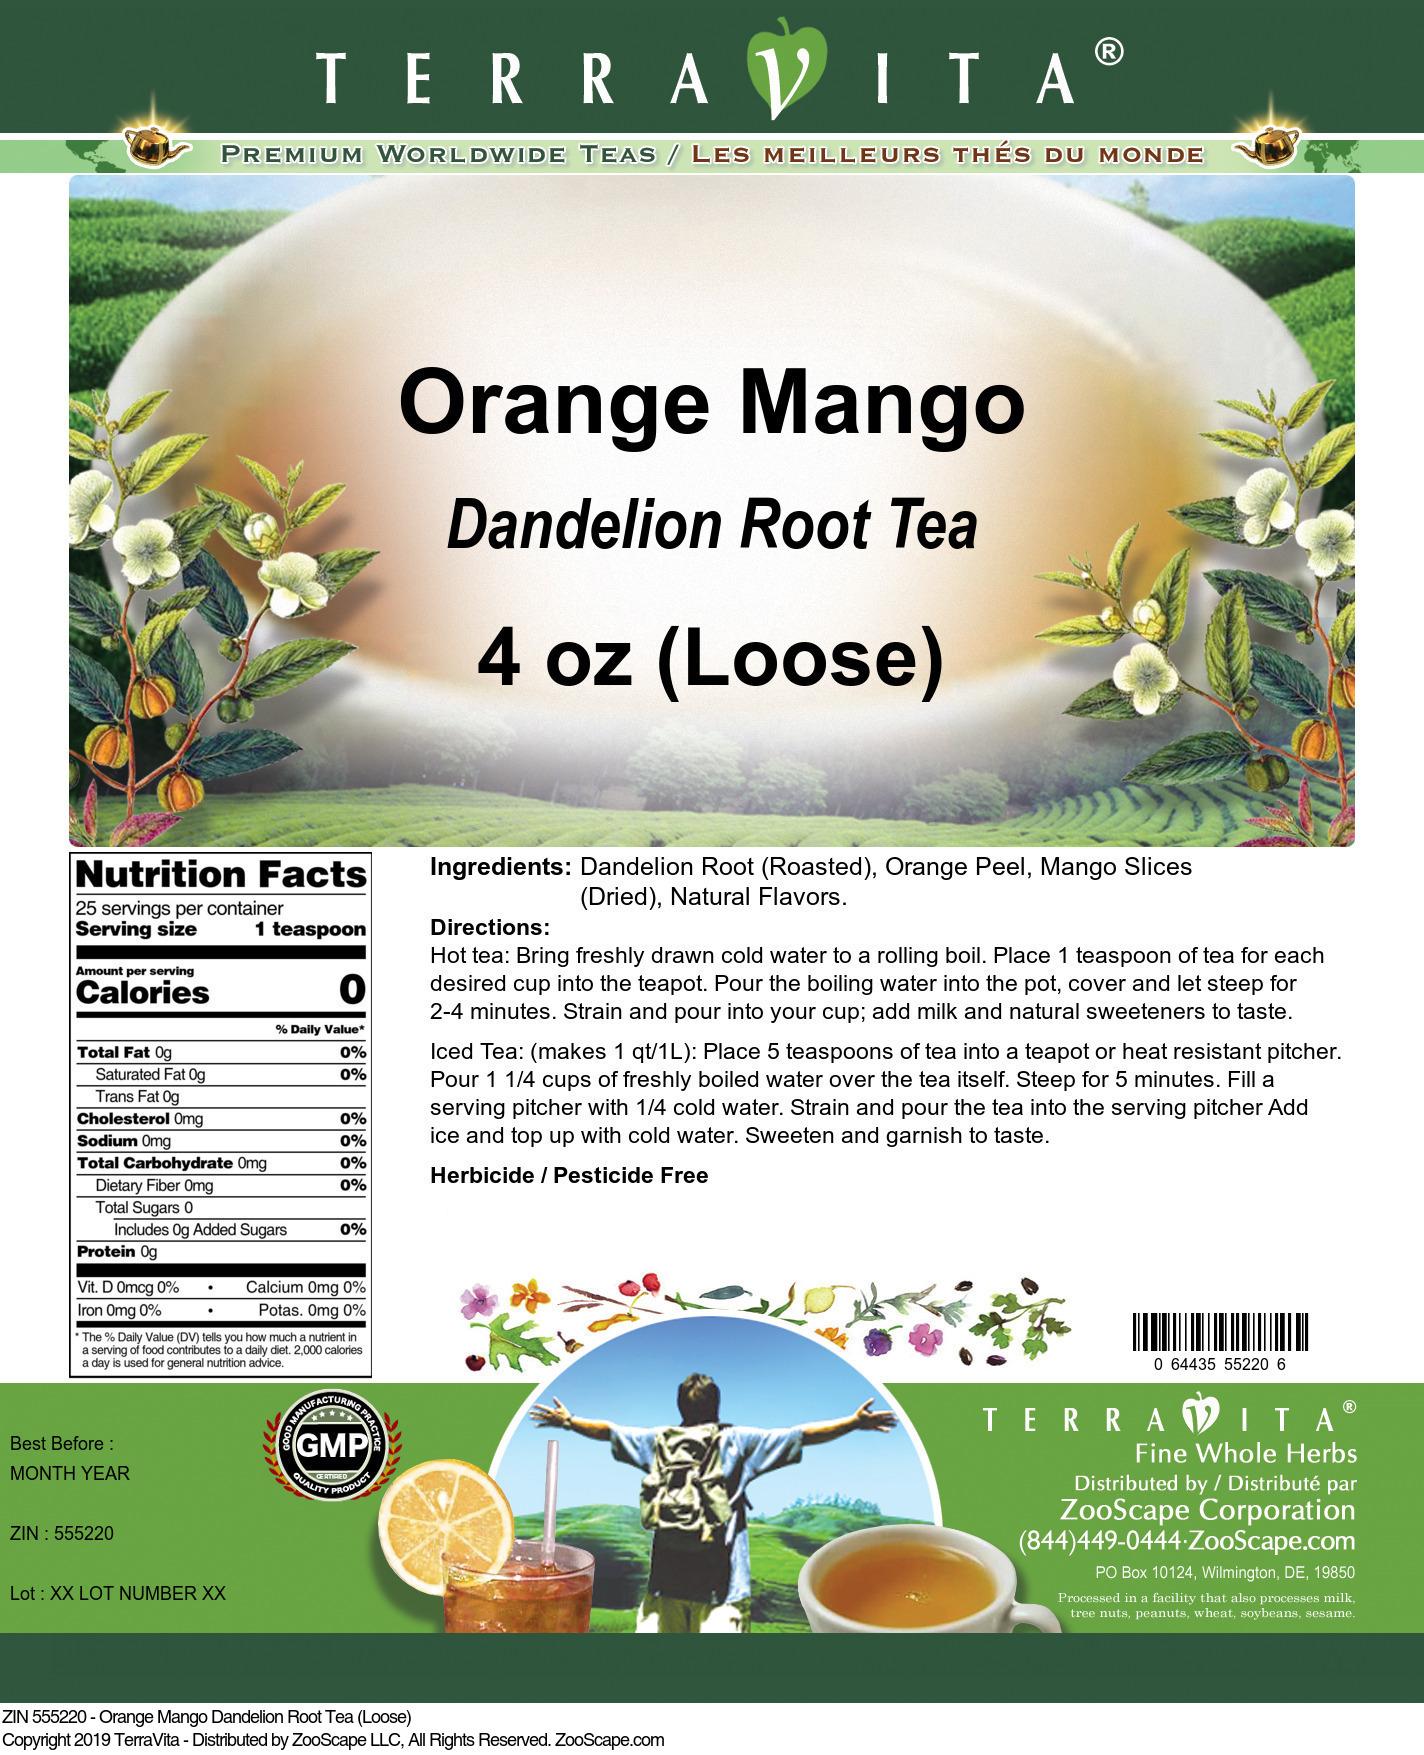 Orange Mango Dandelion Root Tea (Loose)